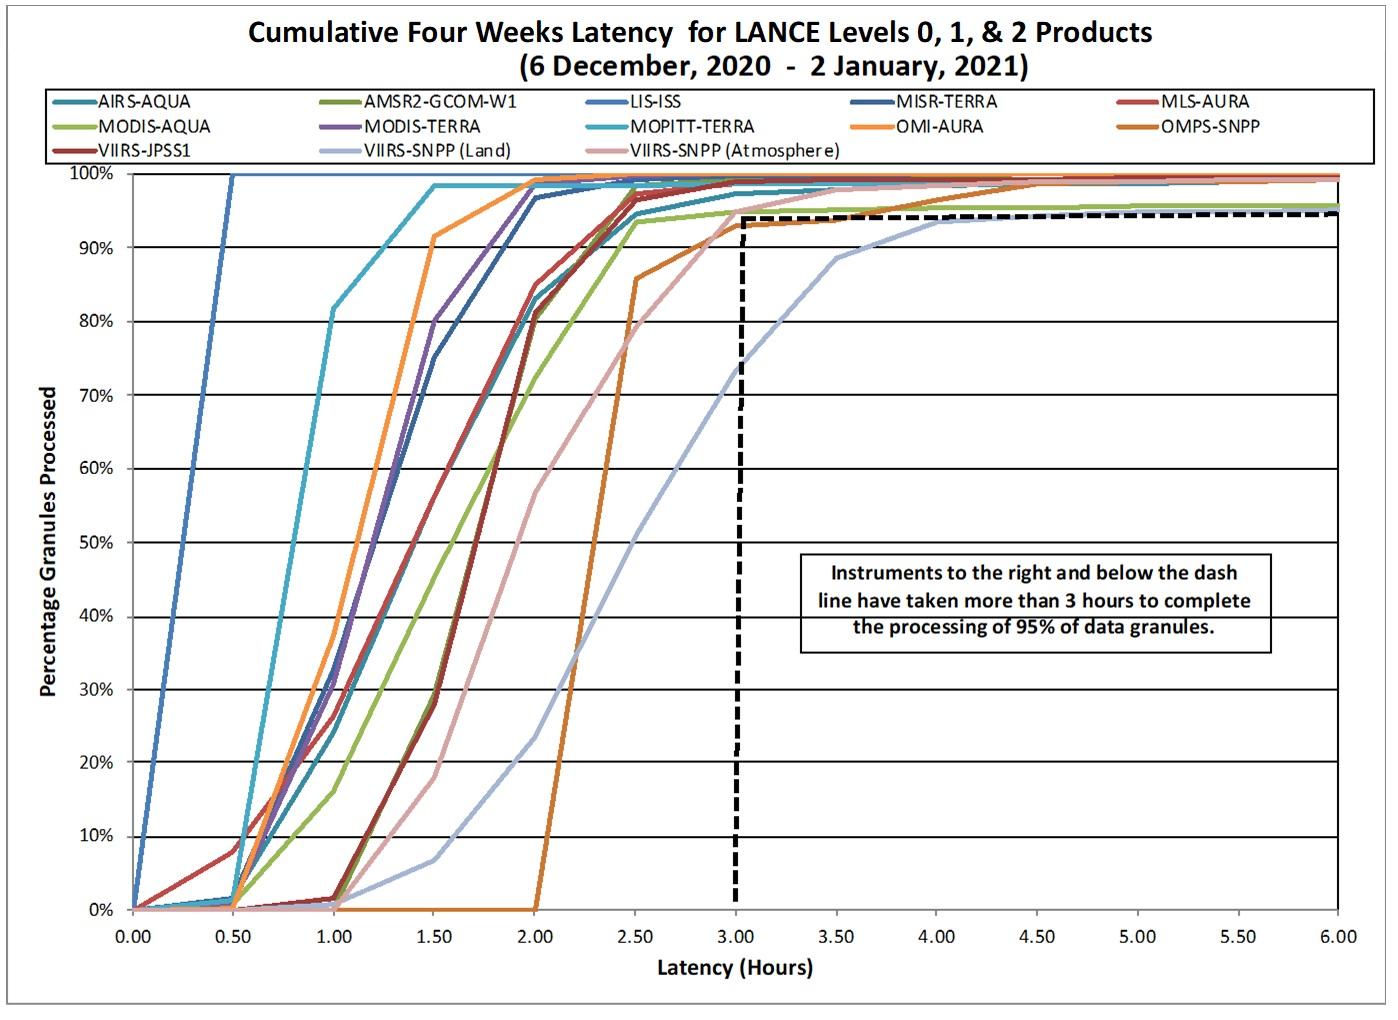 LANCE Metrics 2 1-07-2021